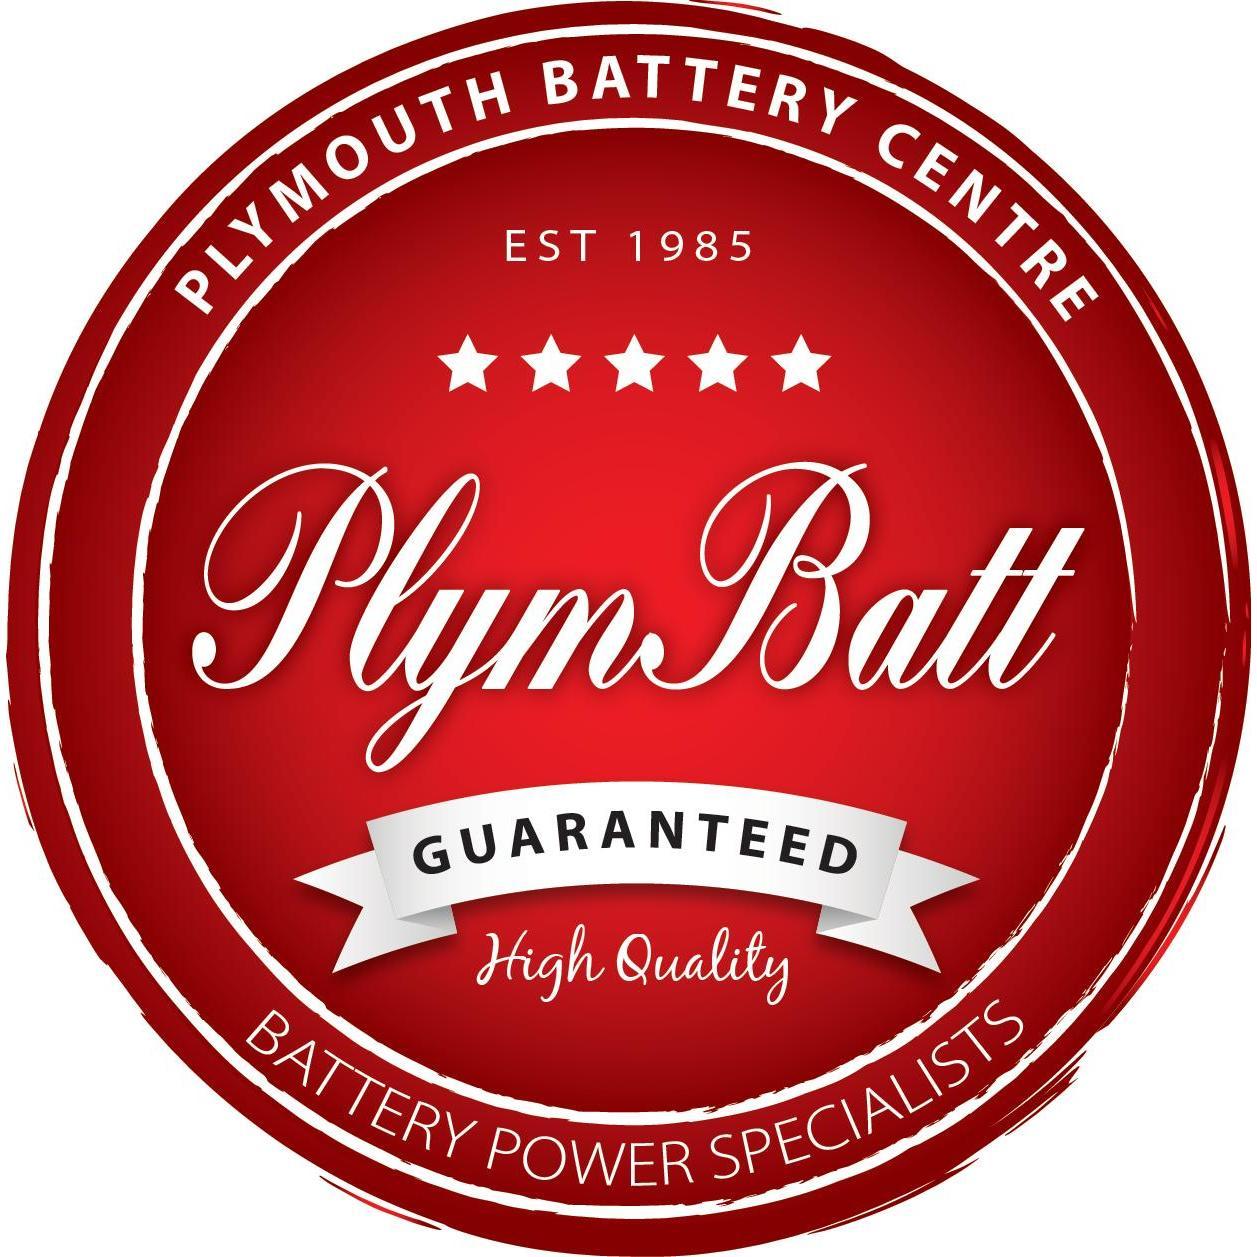 Plymouth Battery Centre Ltd